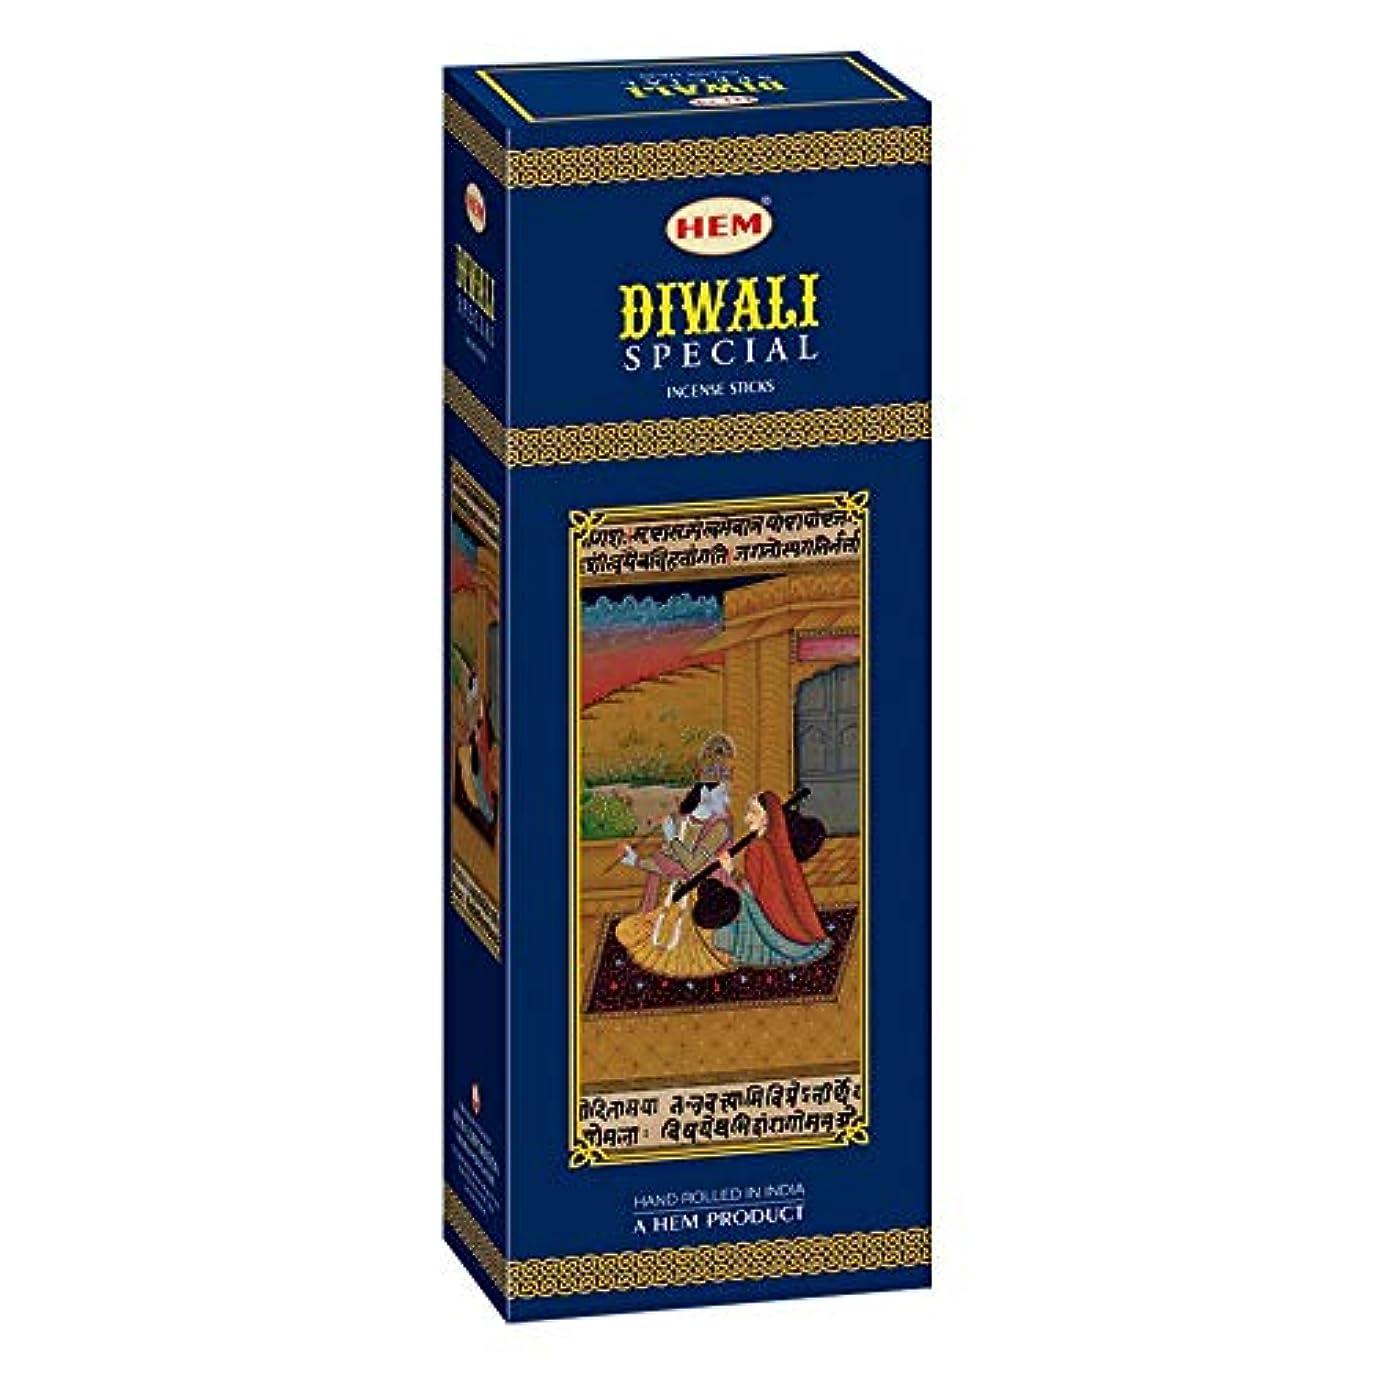 迷信普通に月曜日Hem Diwali Special Incense Sticks(9.3 cm X 6.0 cm X 25.5cm, Black)